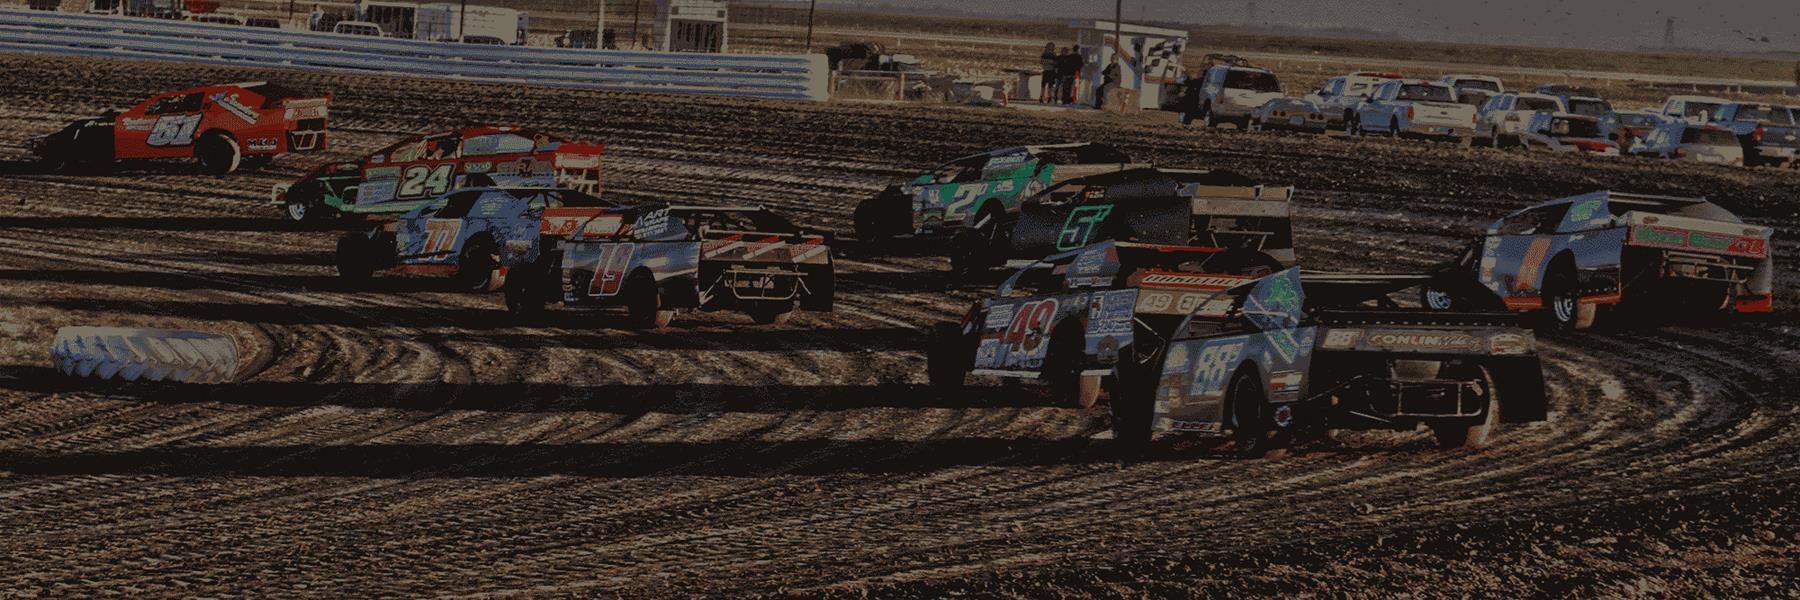 6/30/2021 - Red River Valley Speedway